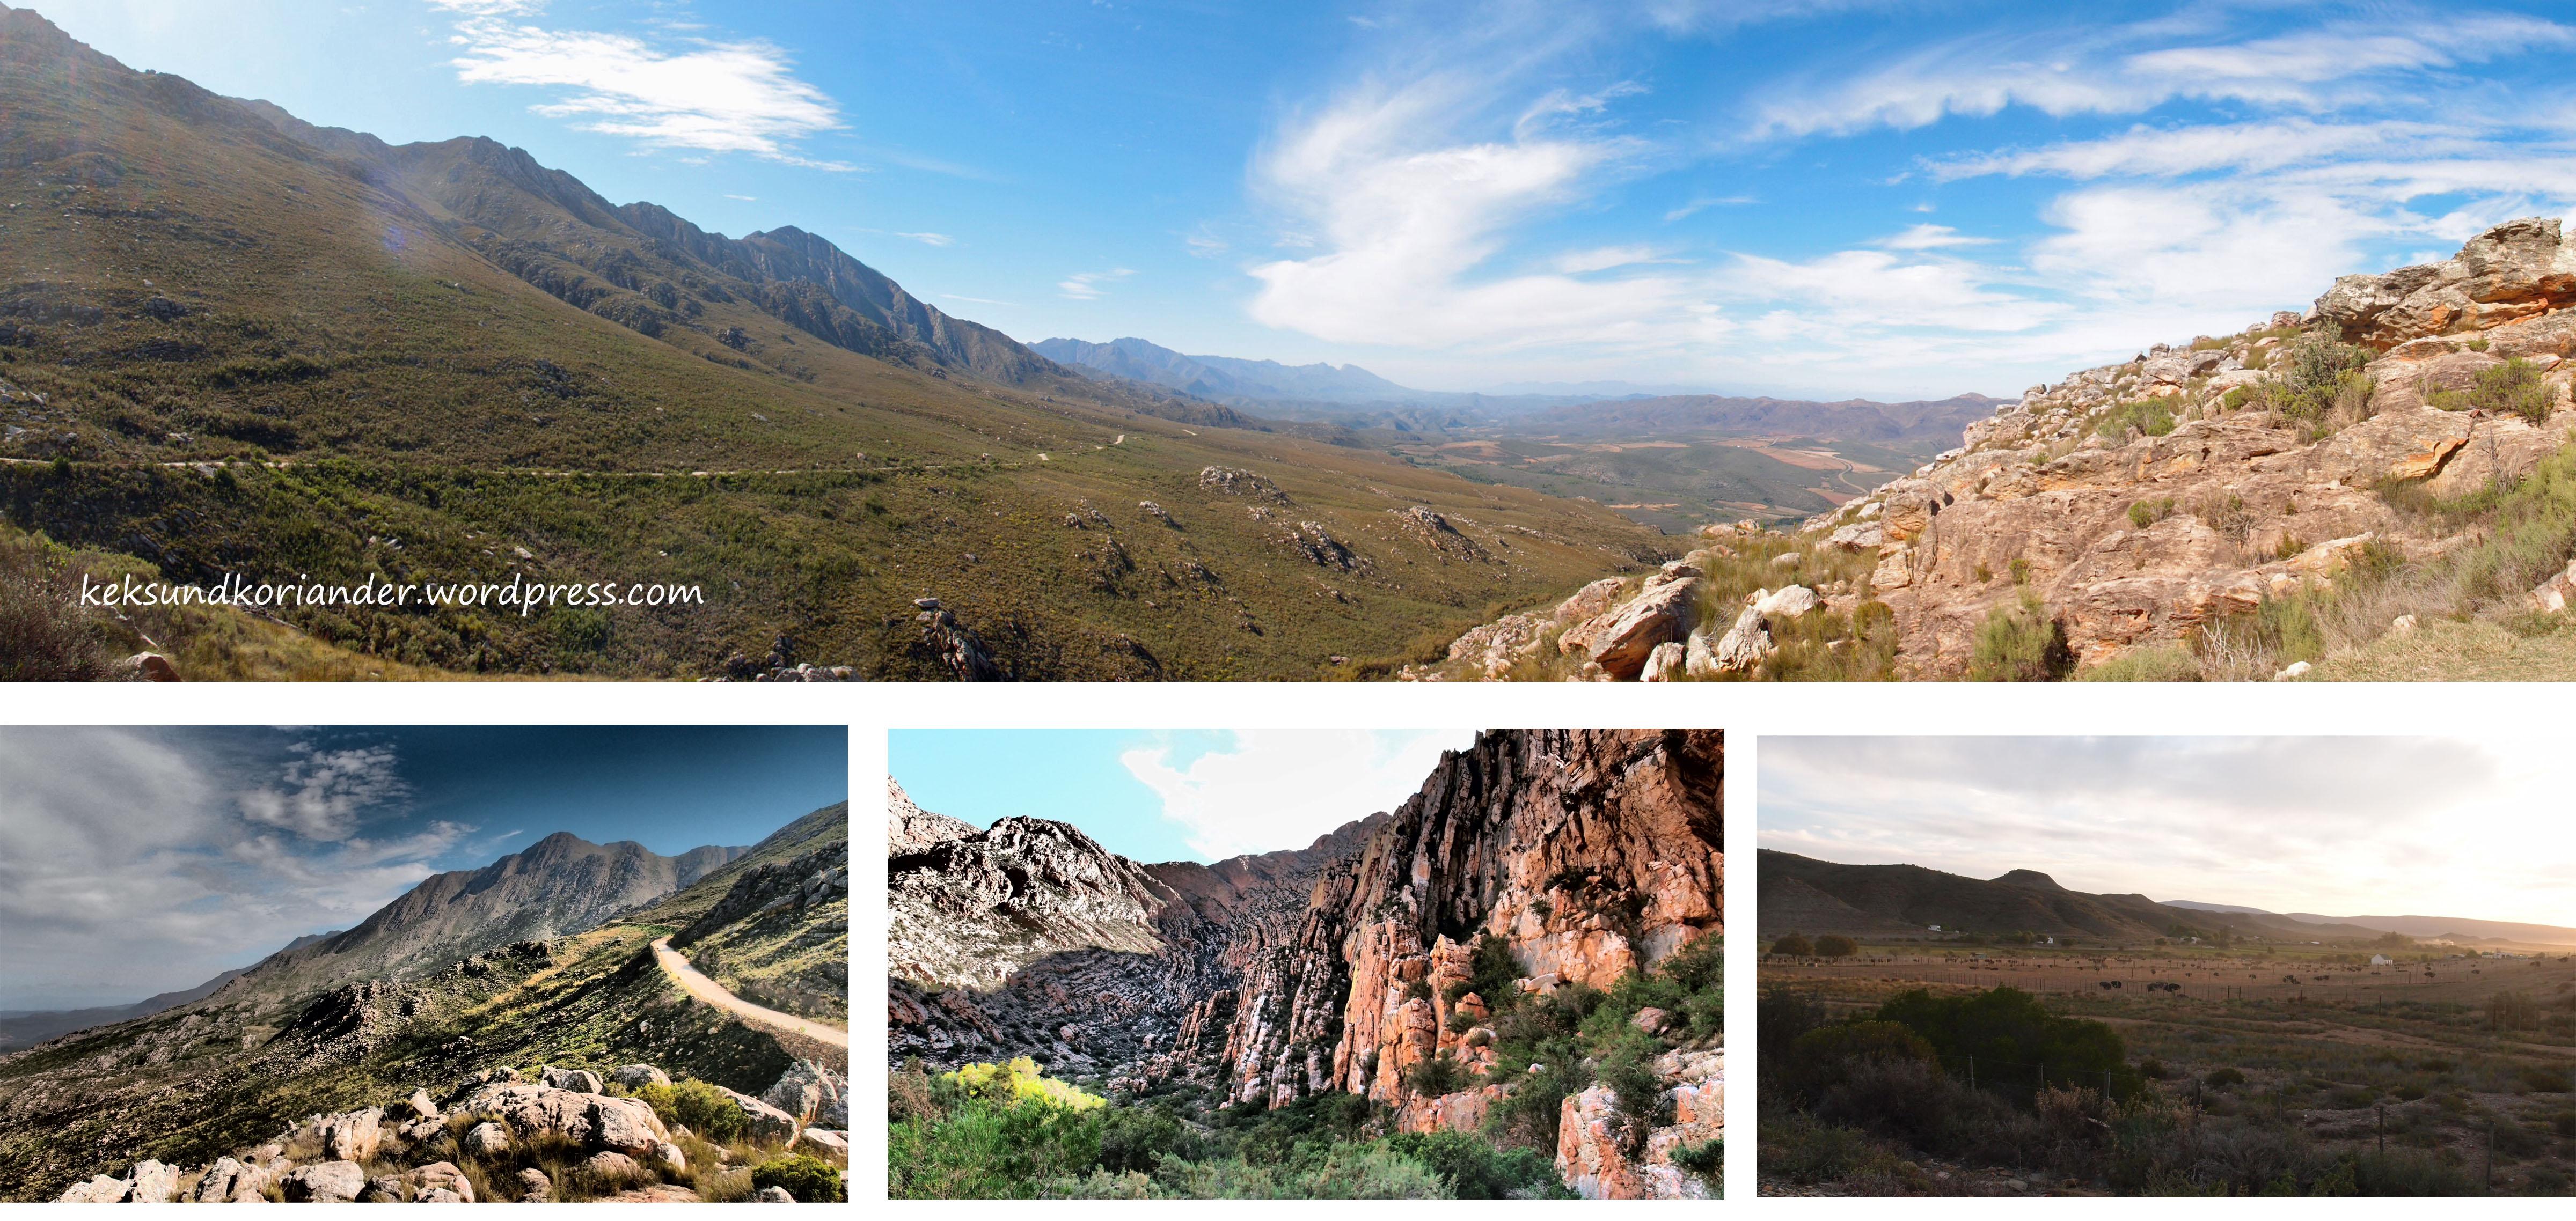 oudtshoorn little karoo garden route südafrika